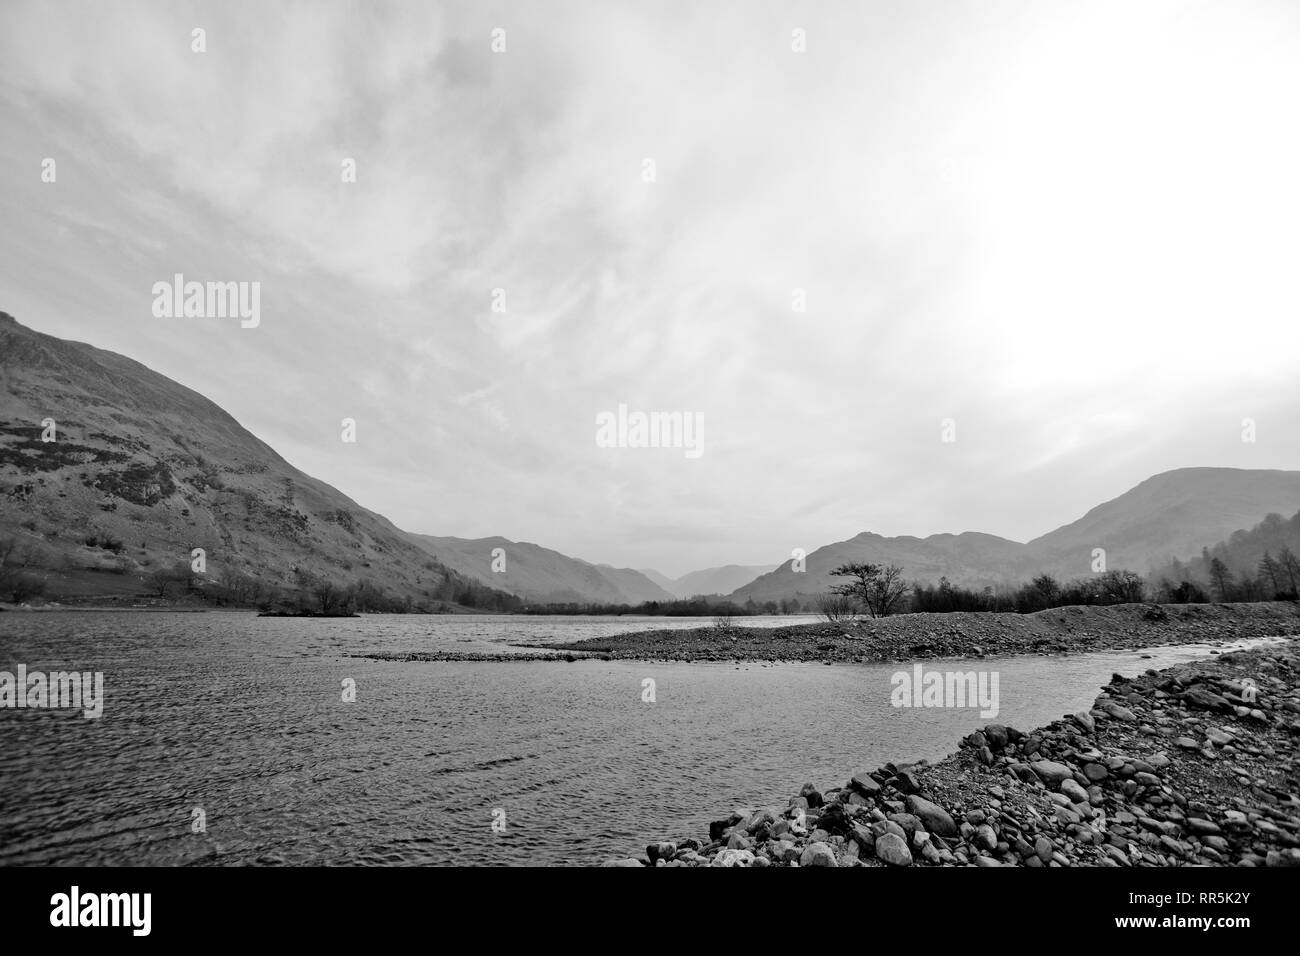 The Lake District, England - Stock Image